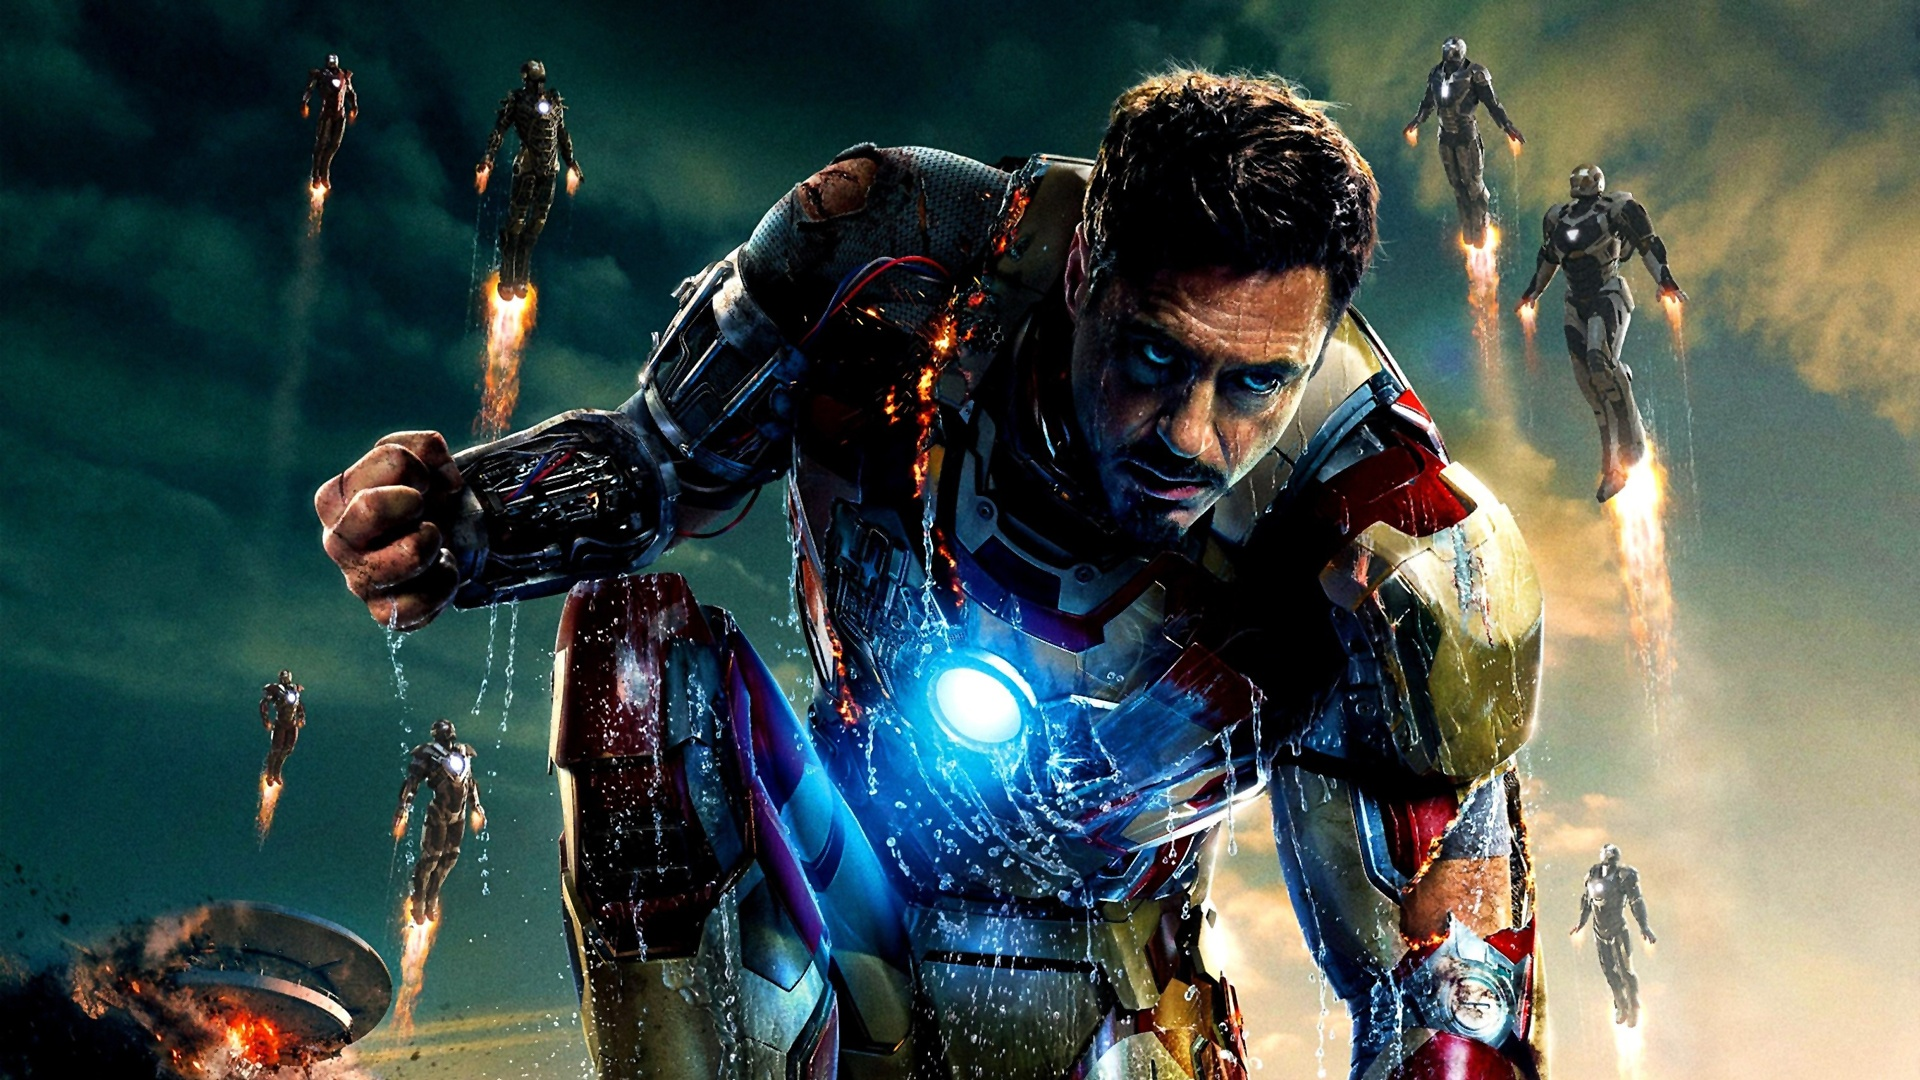 Iron Man 3 Wallpaper 7 1920x1080